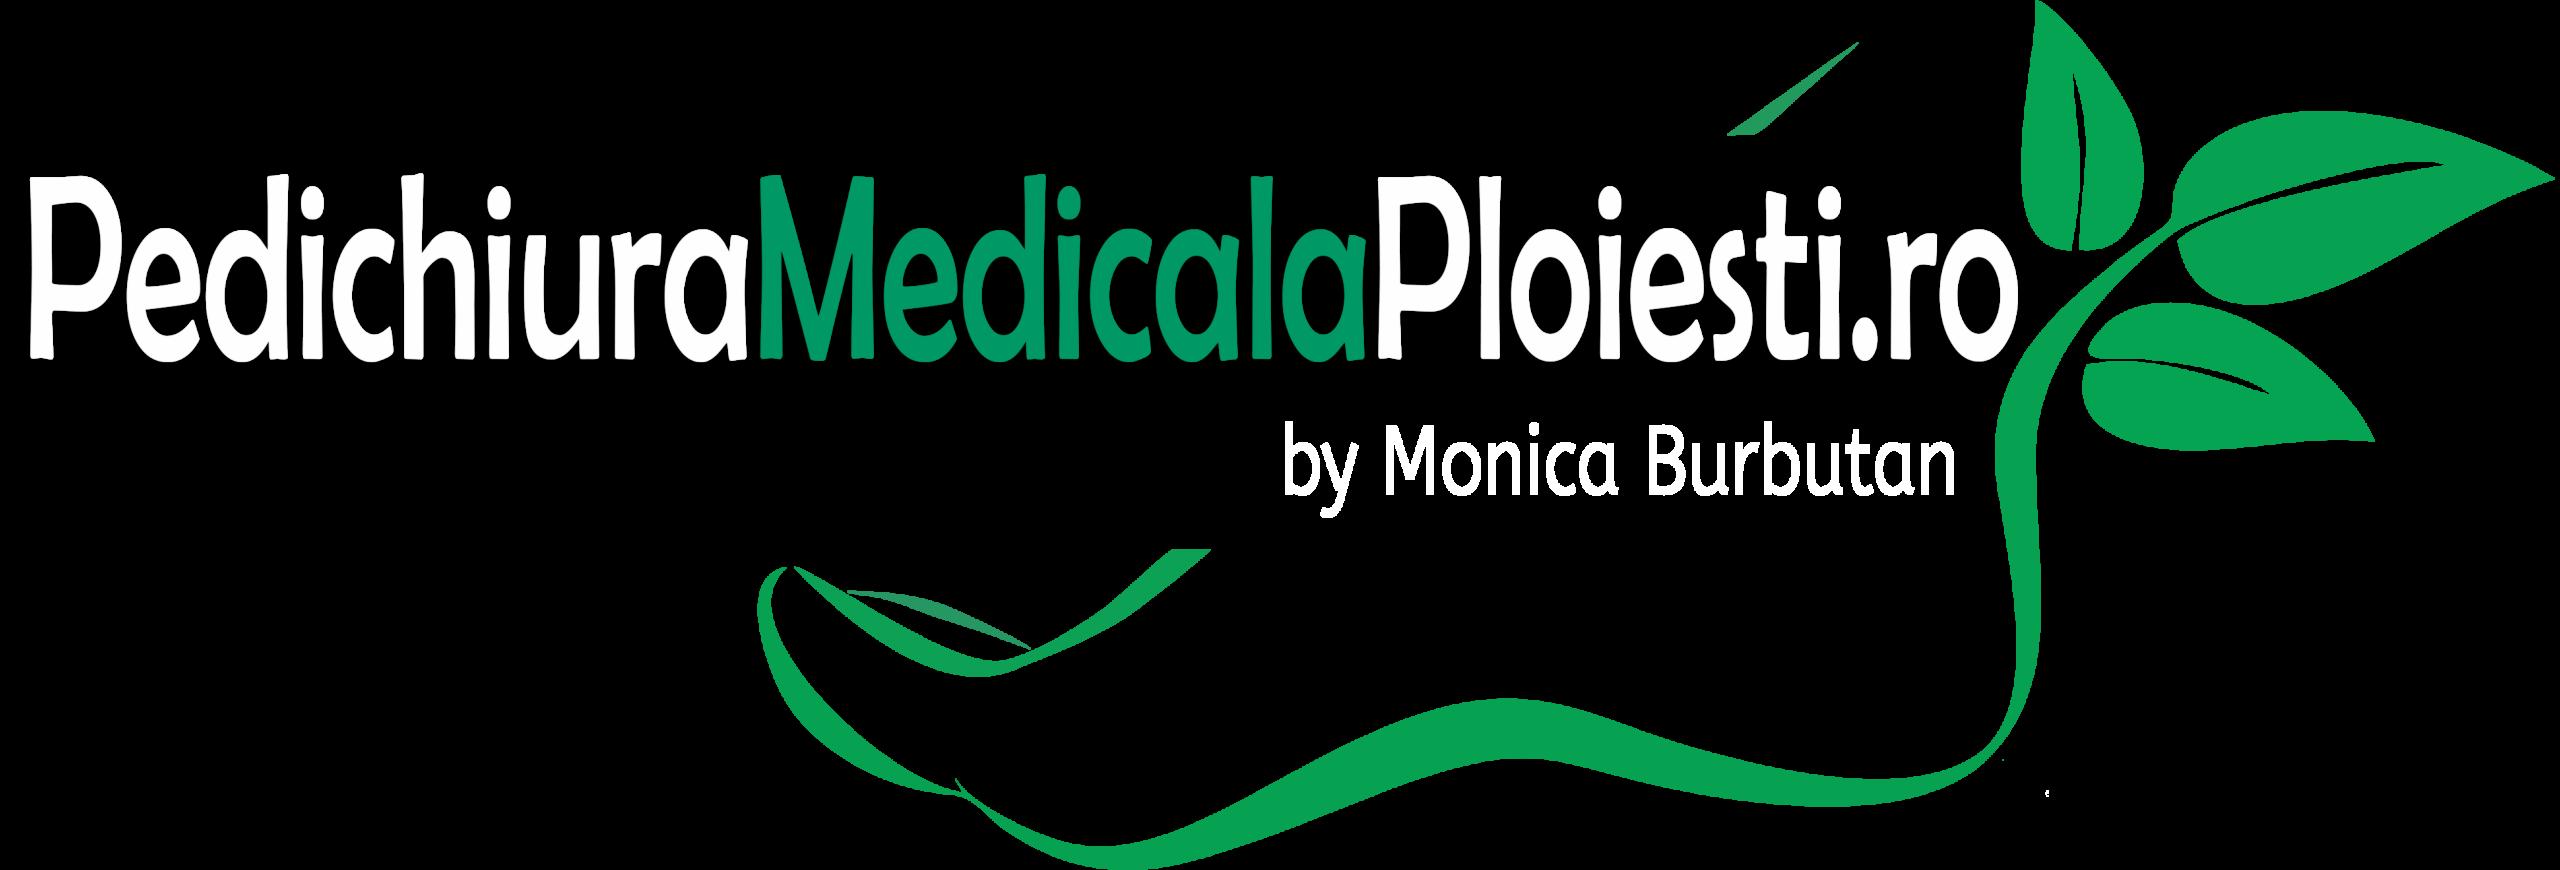 Pedichiura Medicala Ploiesti